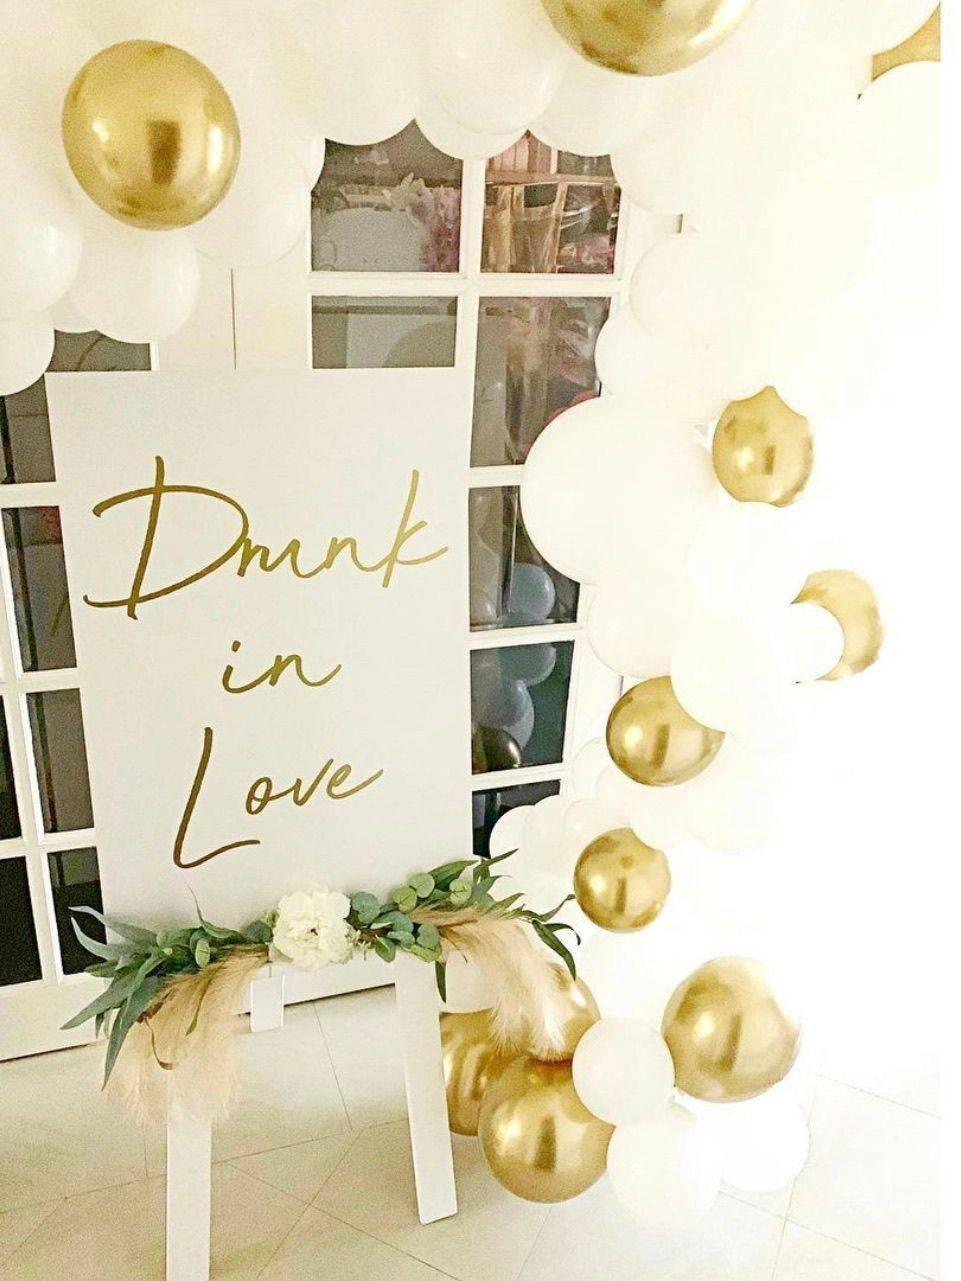 Drunk in Love Sign